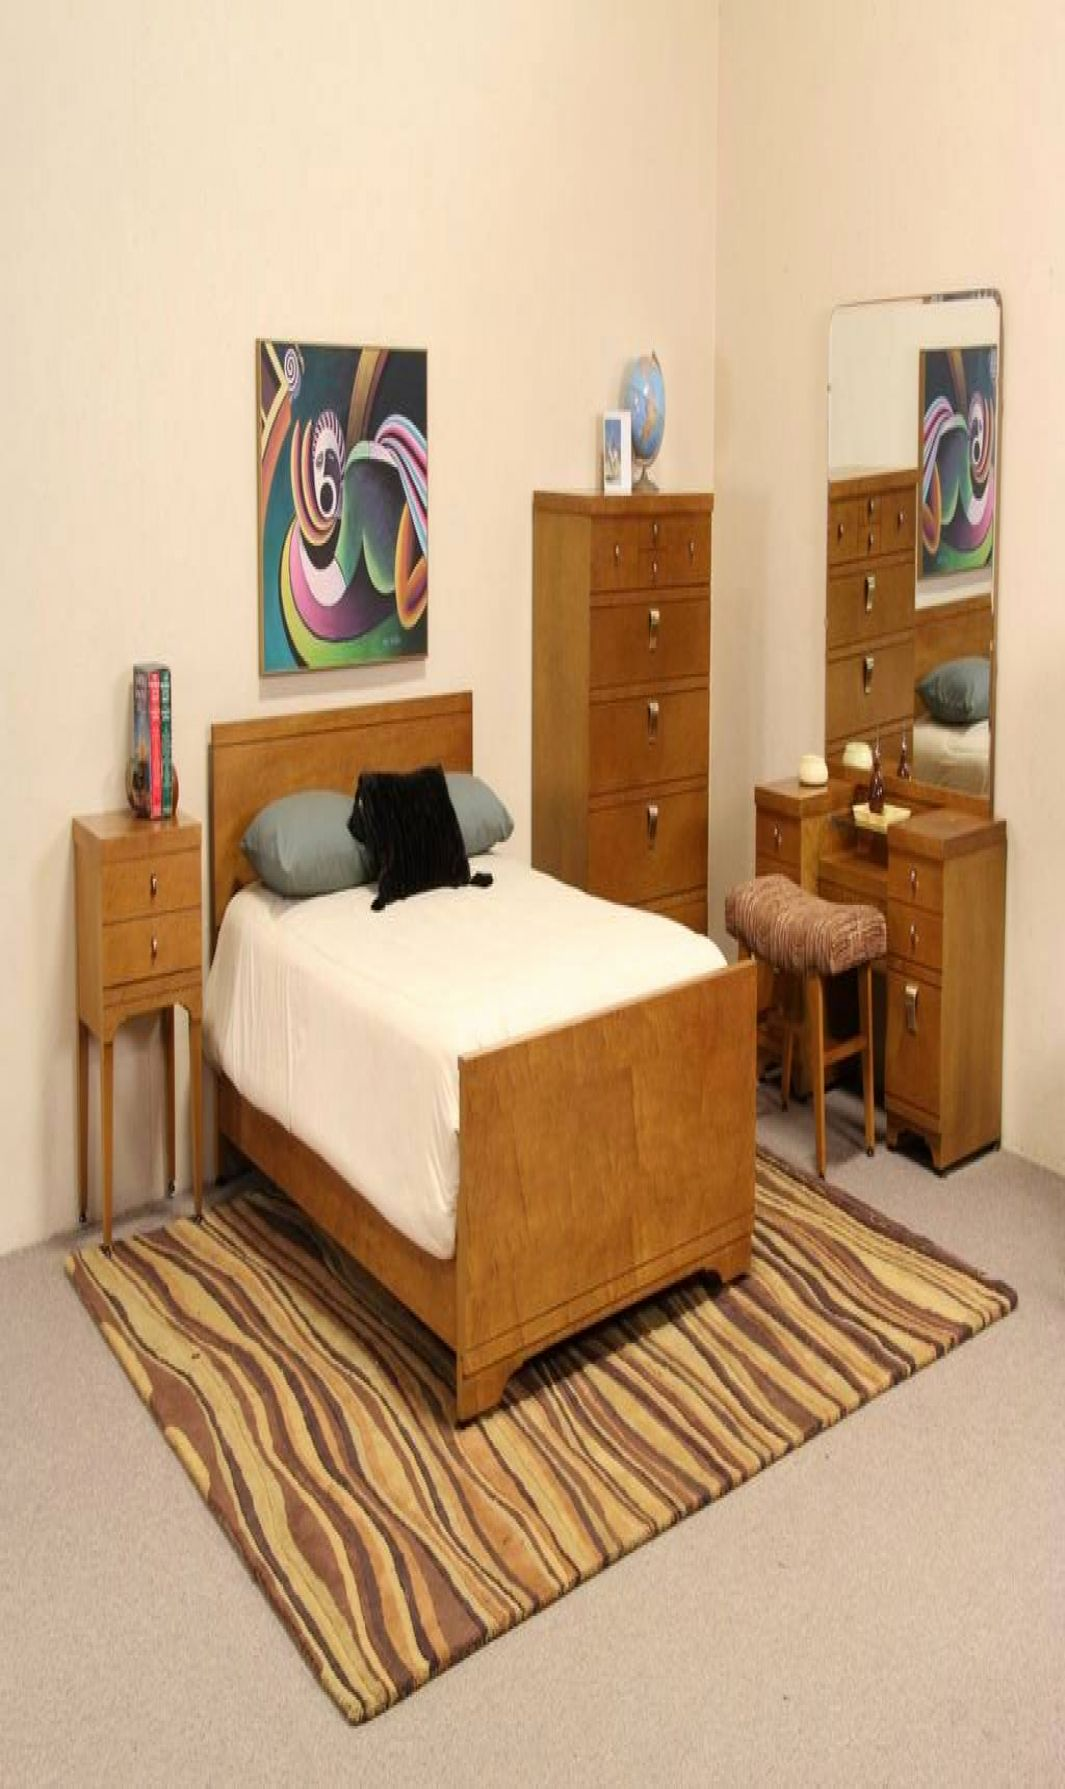 21 Incredible Vintage Home Decor 1950s Furniture Bedroom Set Ashley Bedroom Furniture Sets Home Decor 50s style bedroom furniture